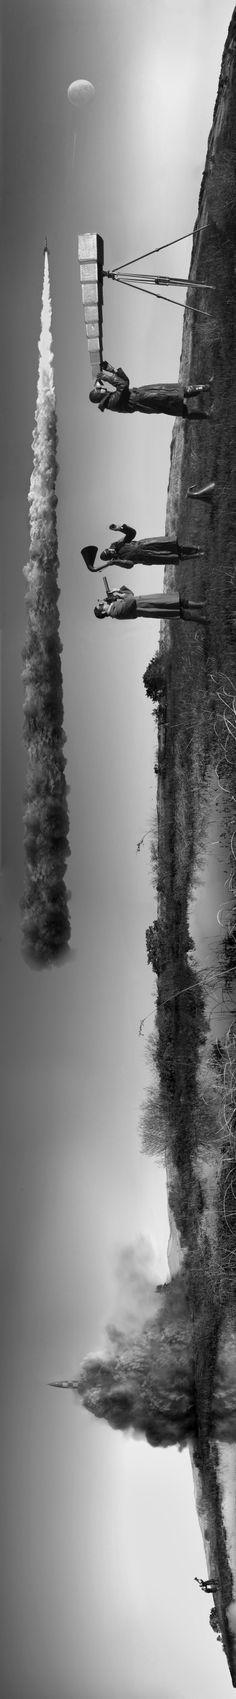 """Apollo Prophecy"" (Lift Off) by Nicholas Kahn & Richard Selesnick, 2012."